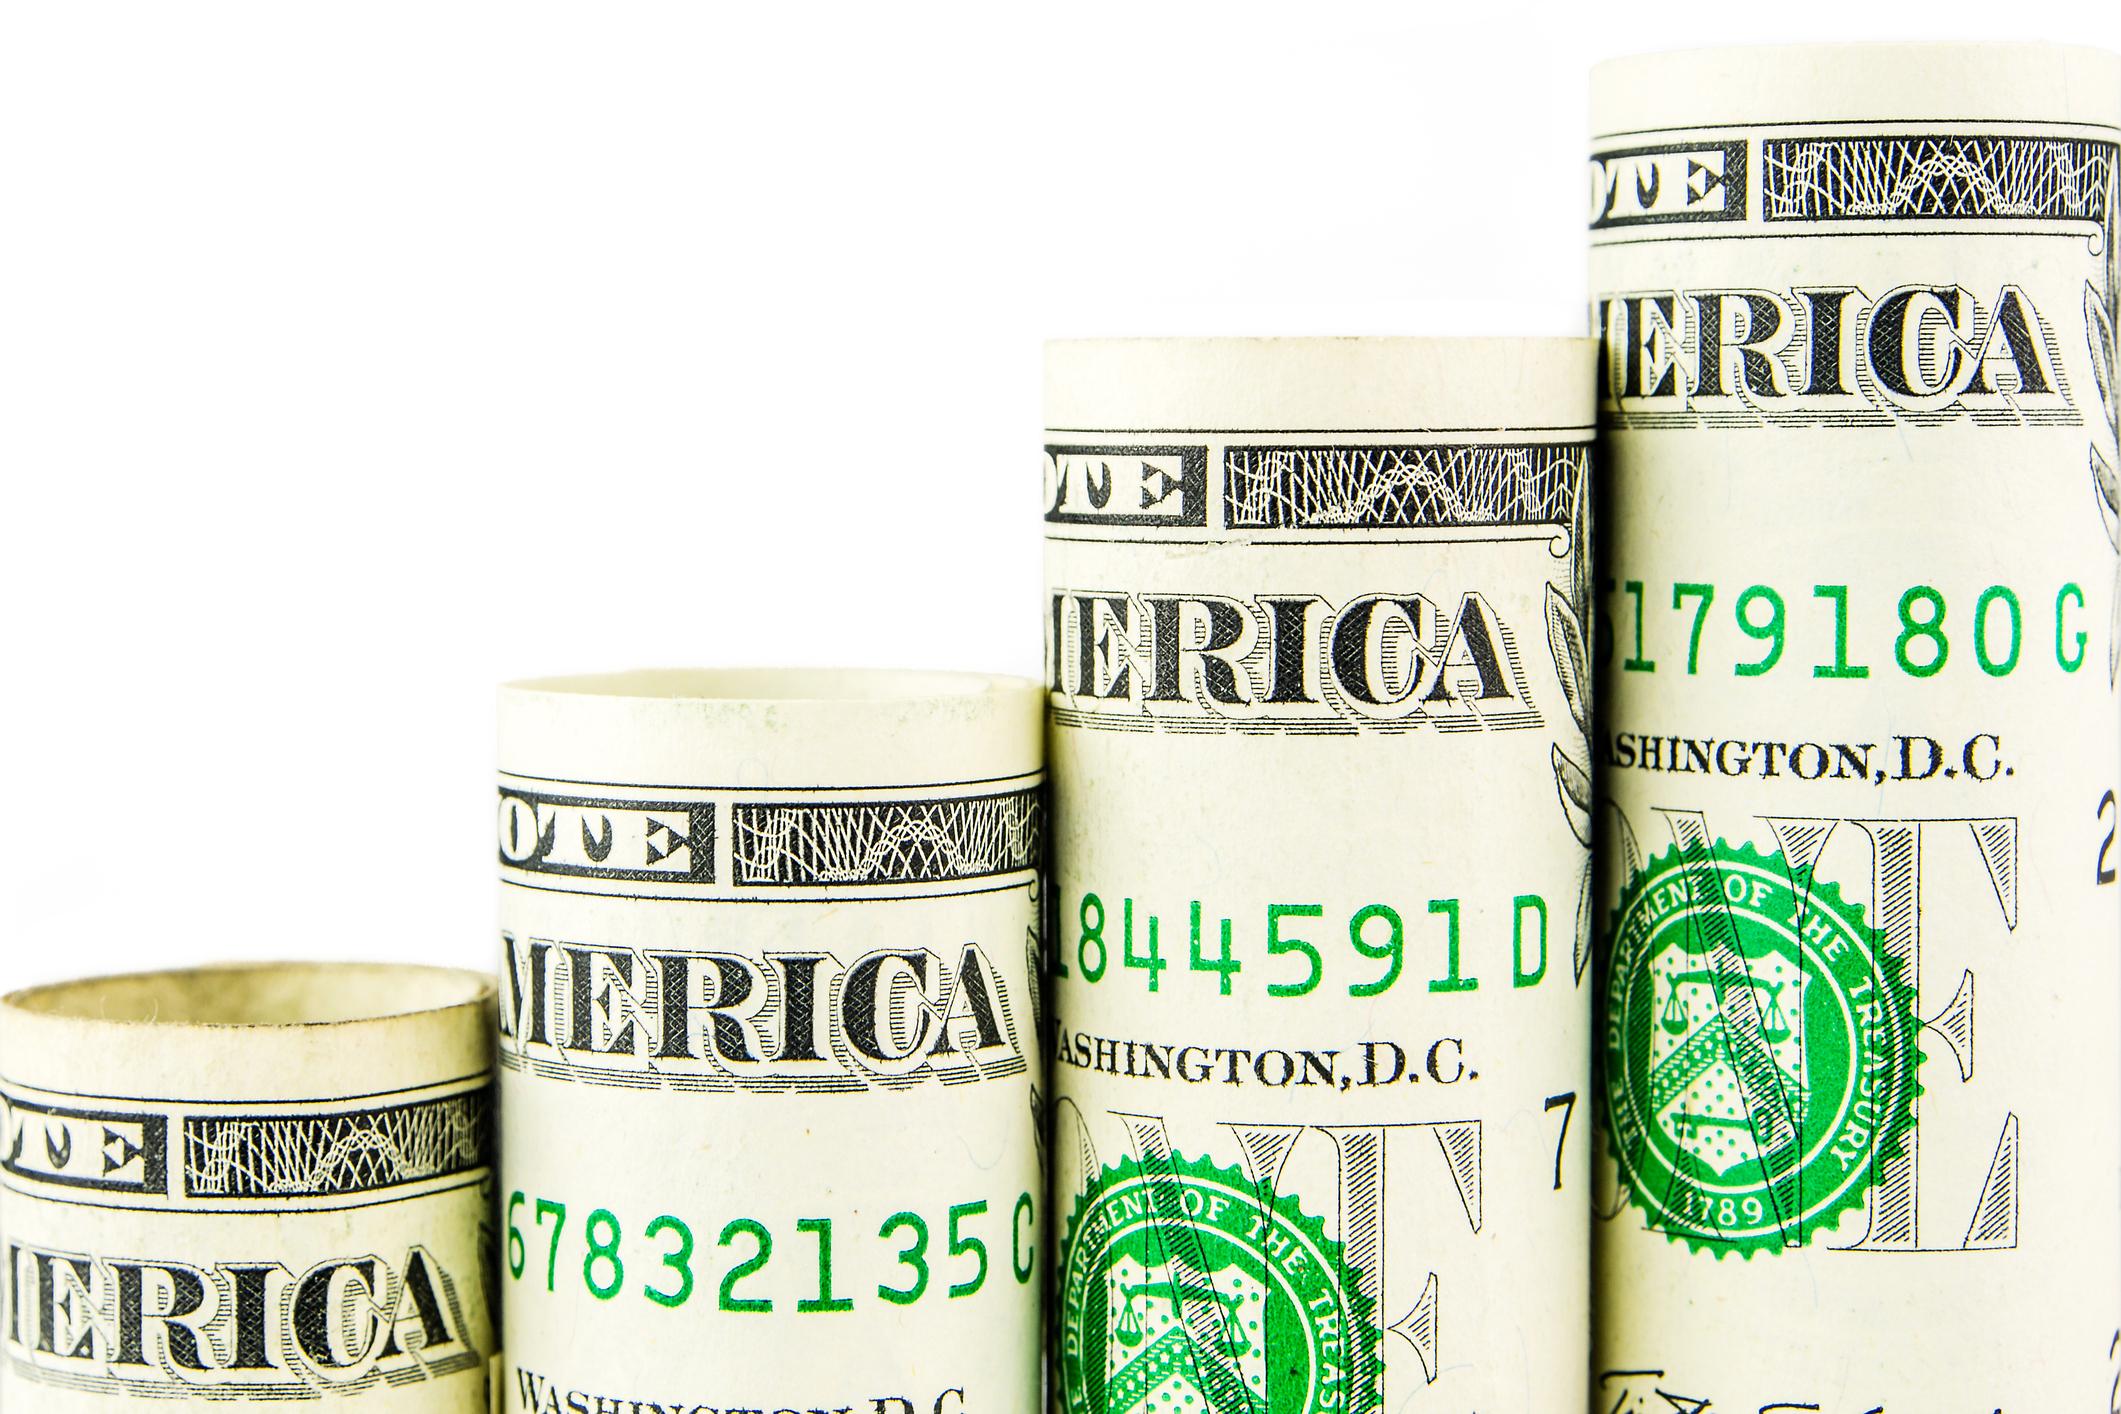 Rolled dollar bills rising in a stair-step fashion